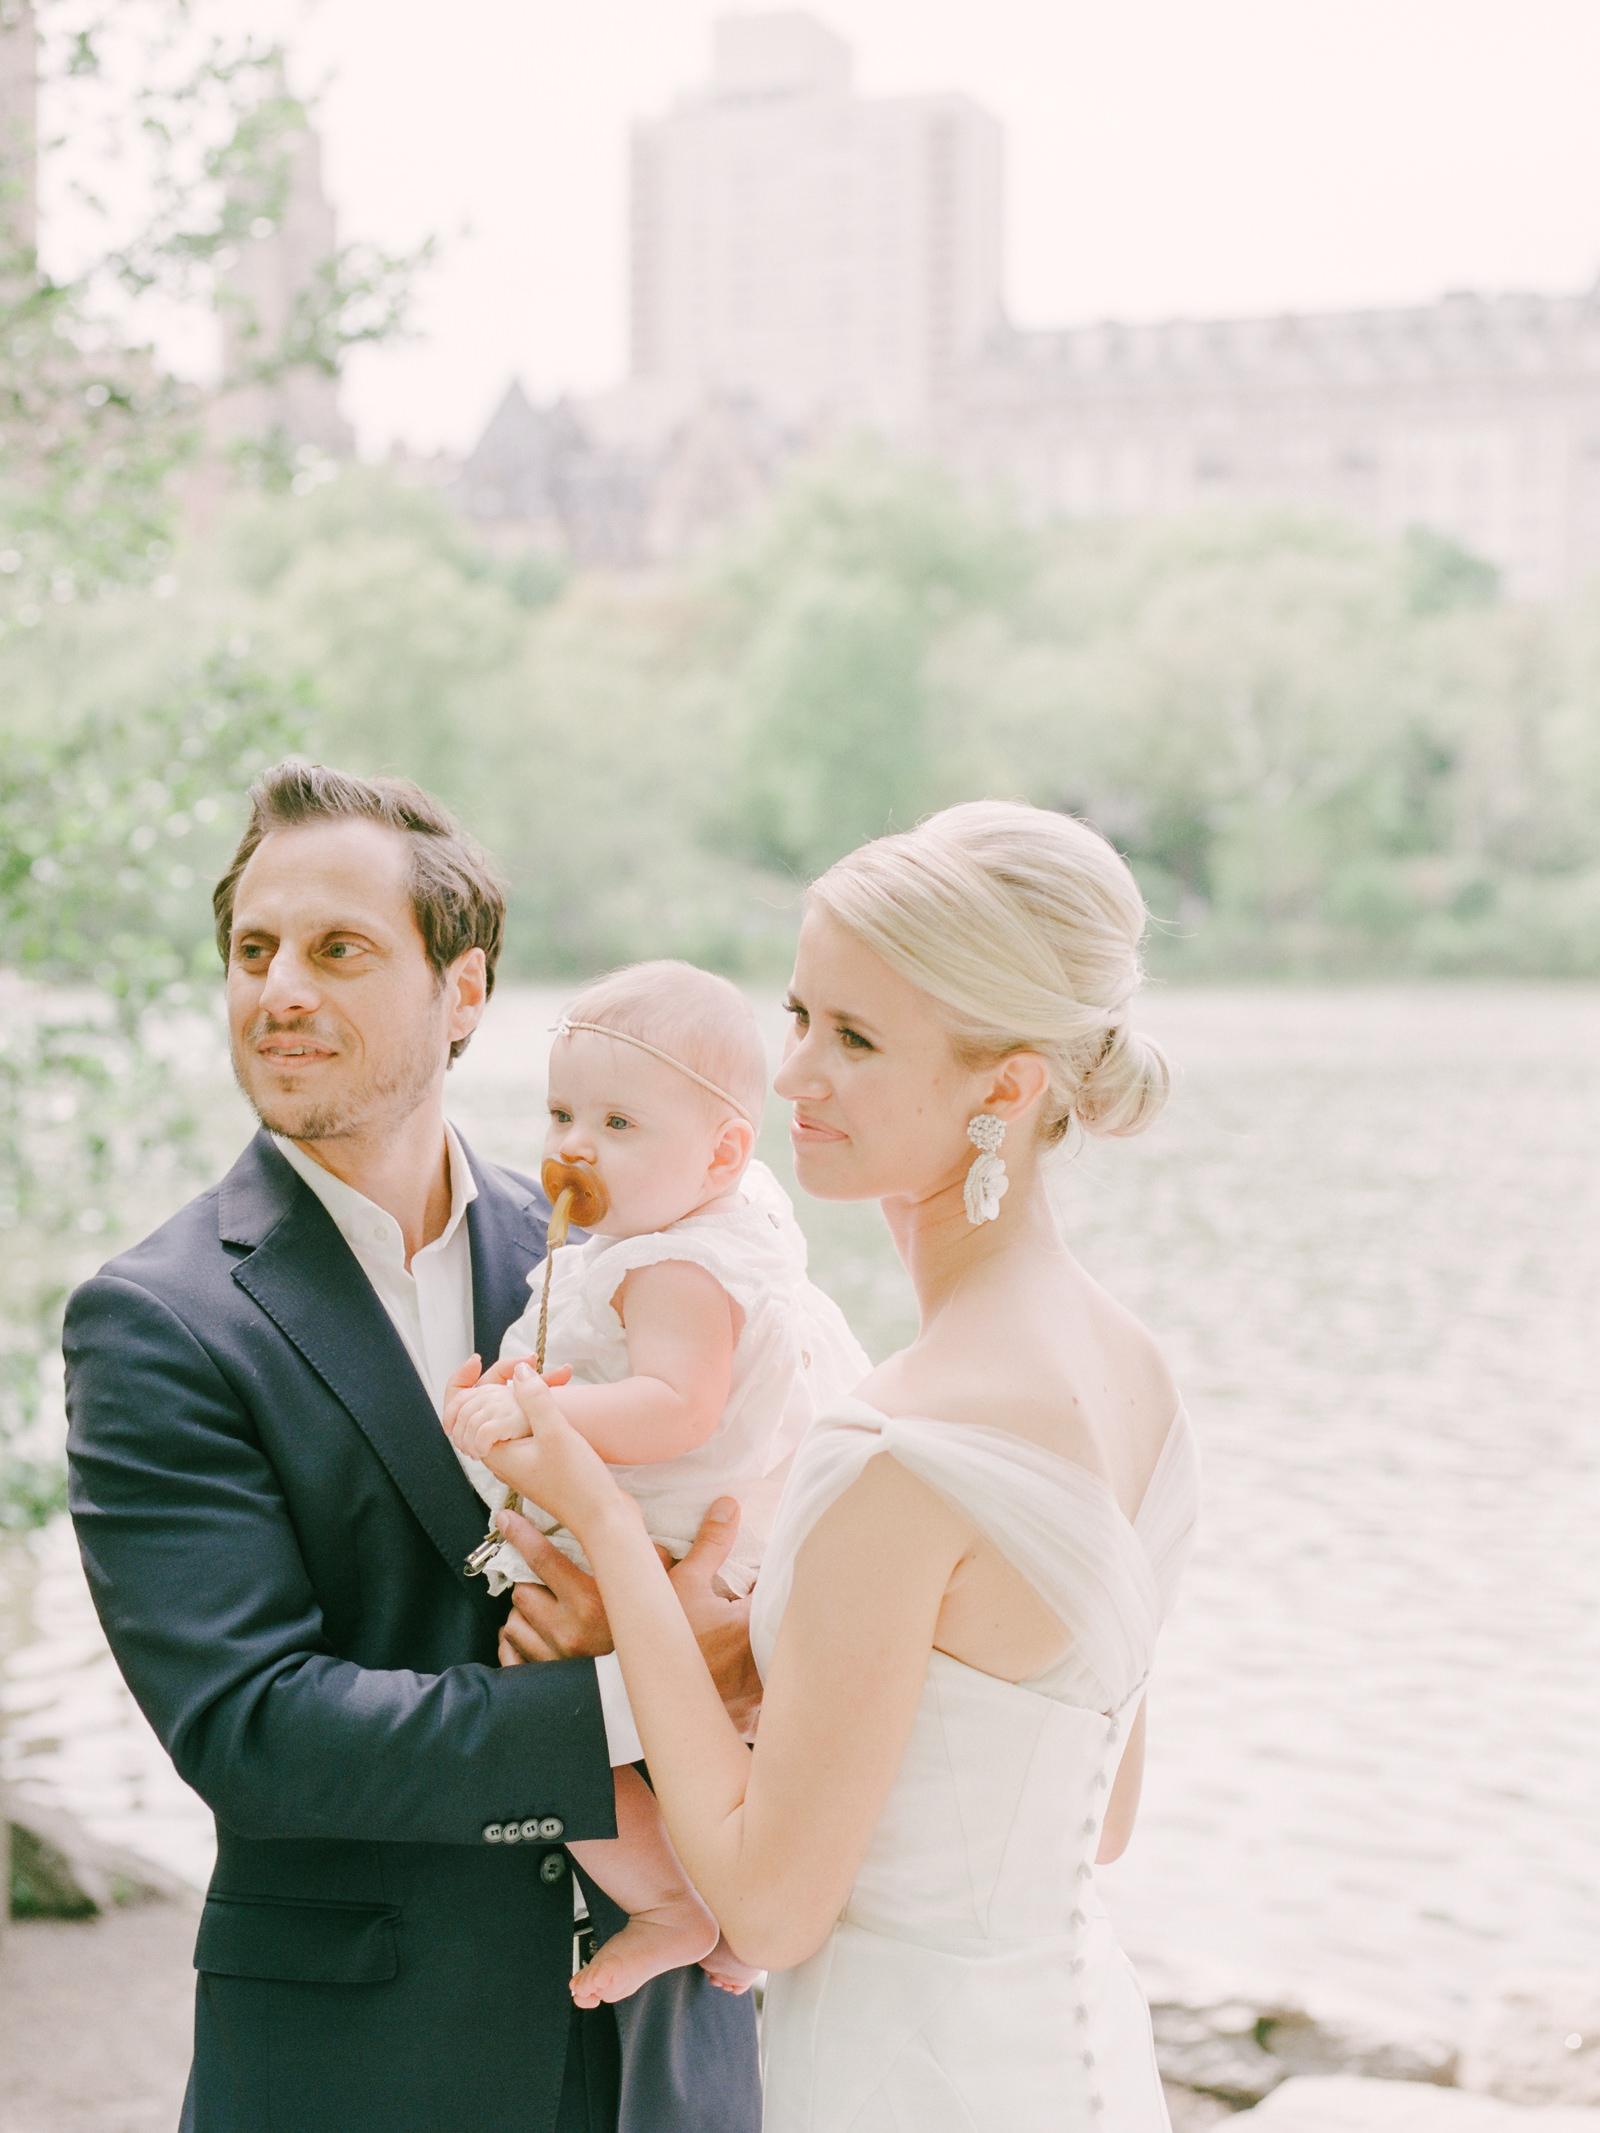 Intimate-NYC_wedding_ by Tanya Isaeva-100.jpg